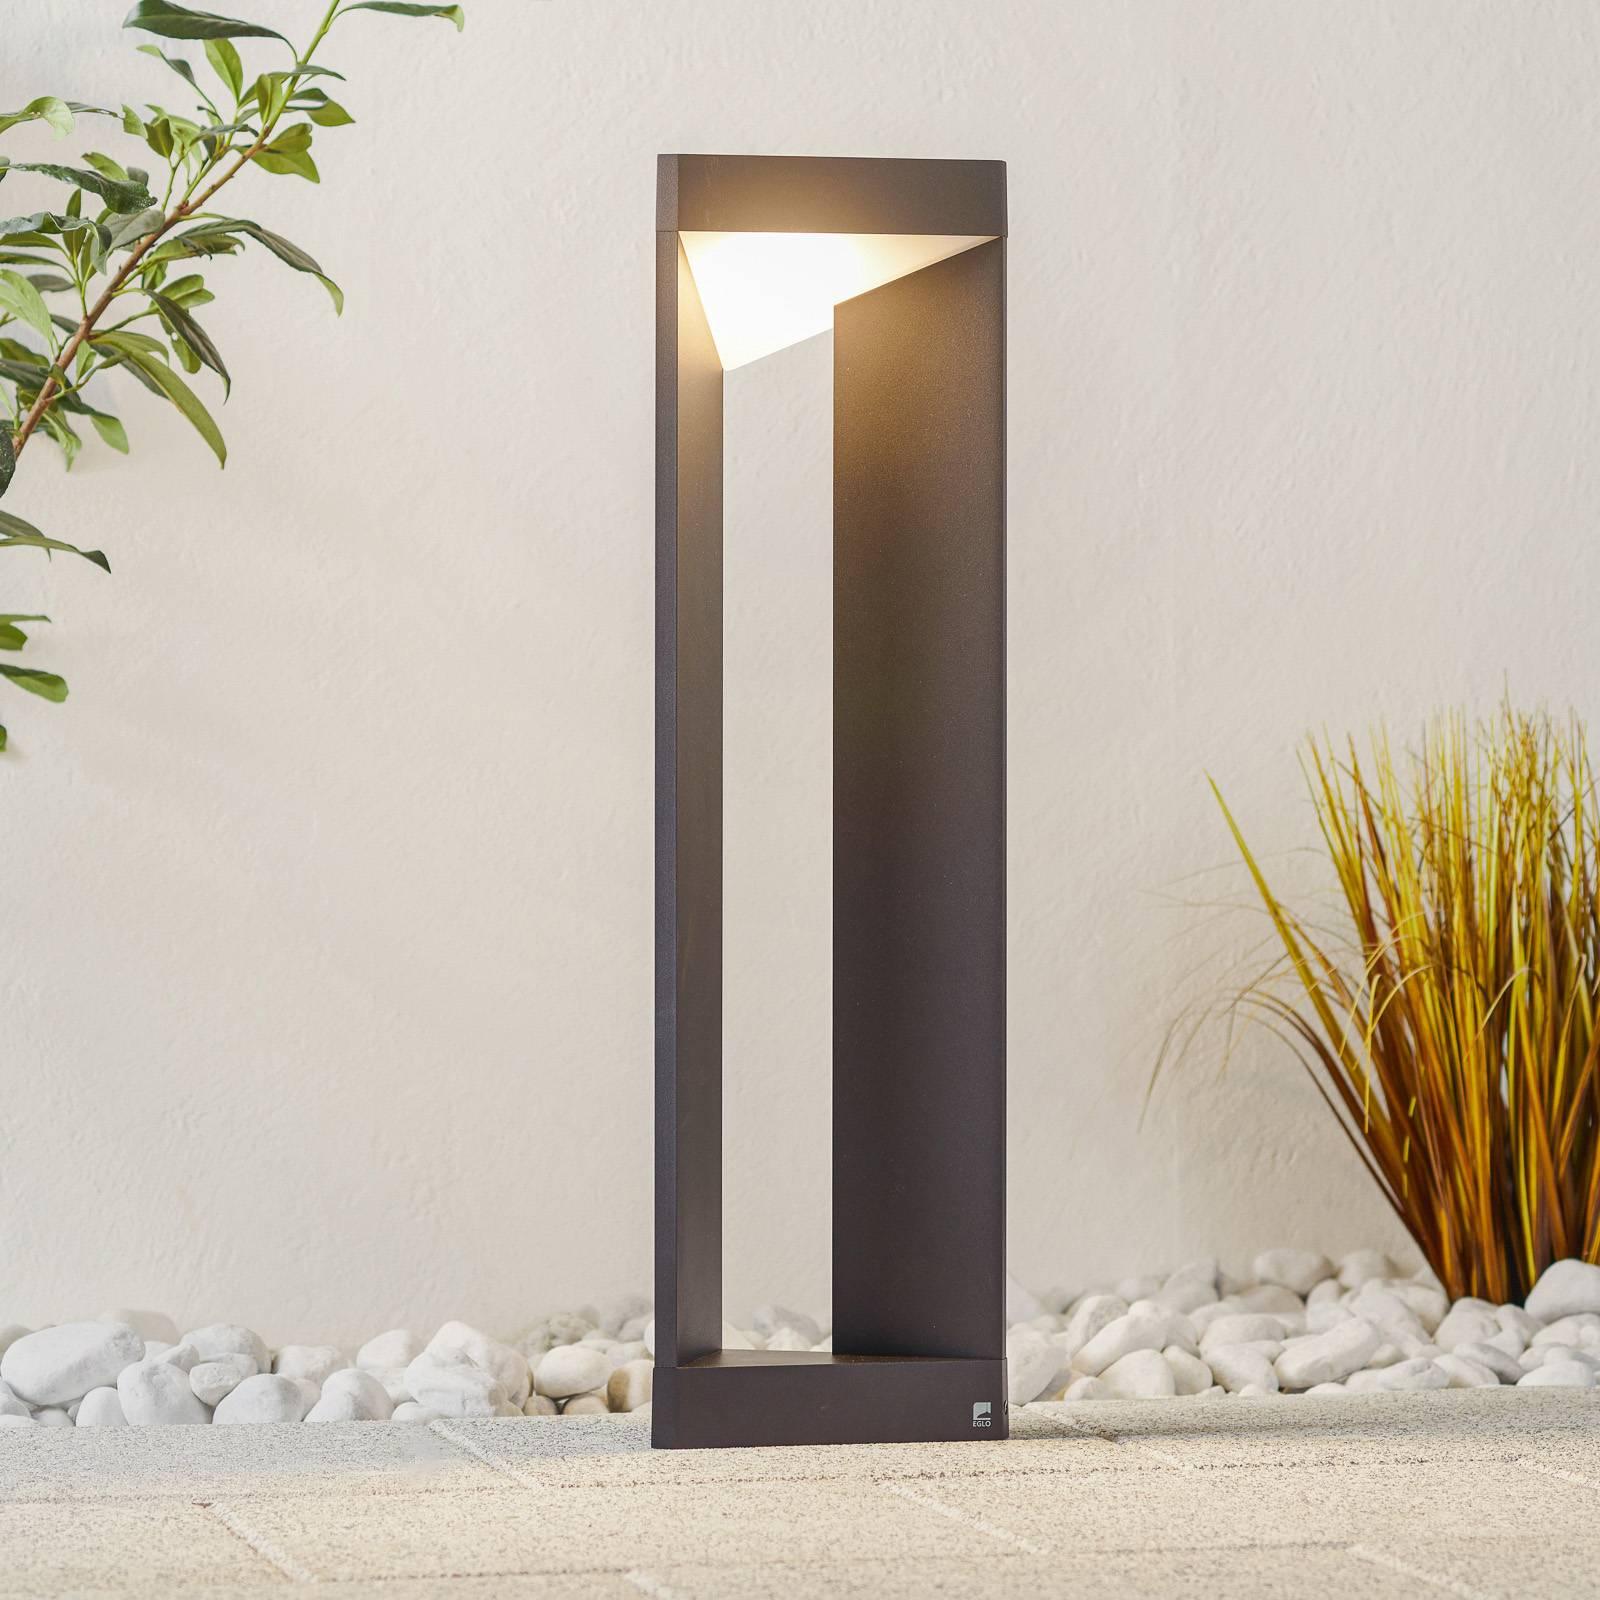 Słupek ogrodowy LED Nembro IP54 odlew aluminium